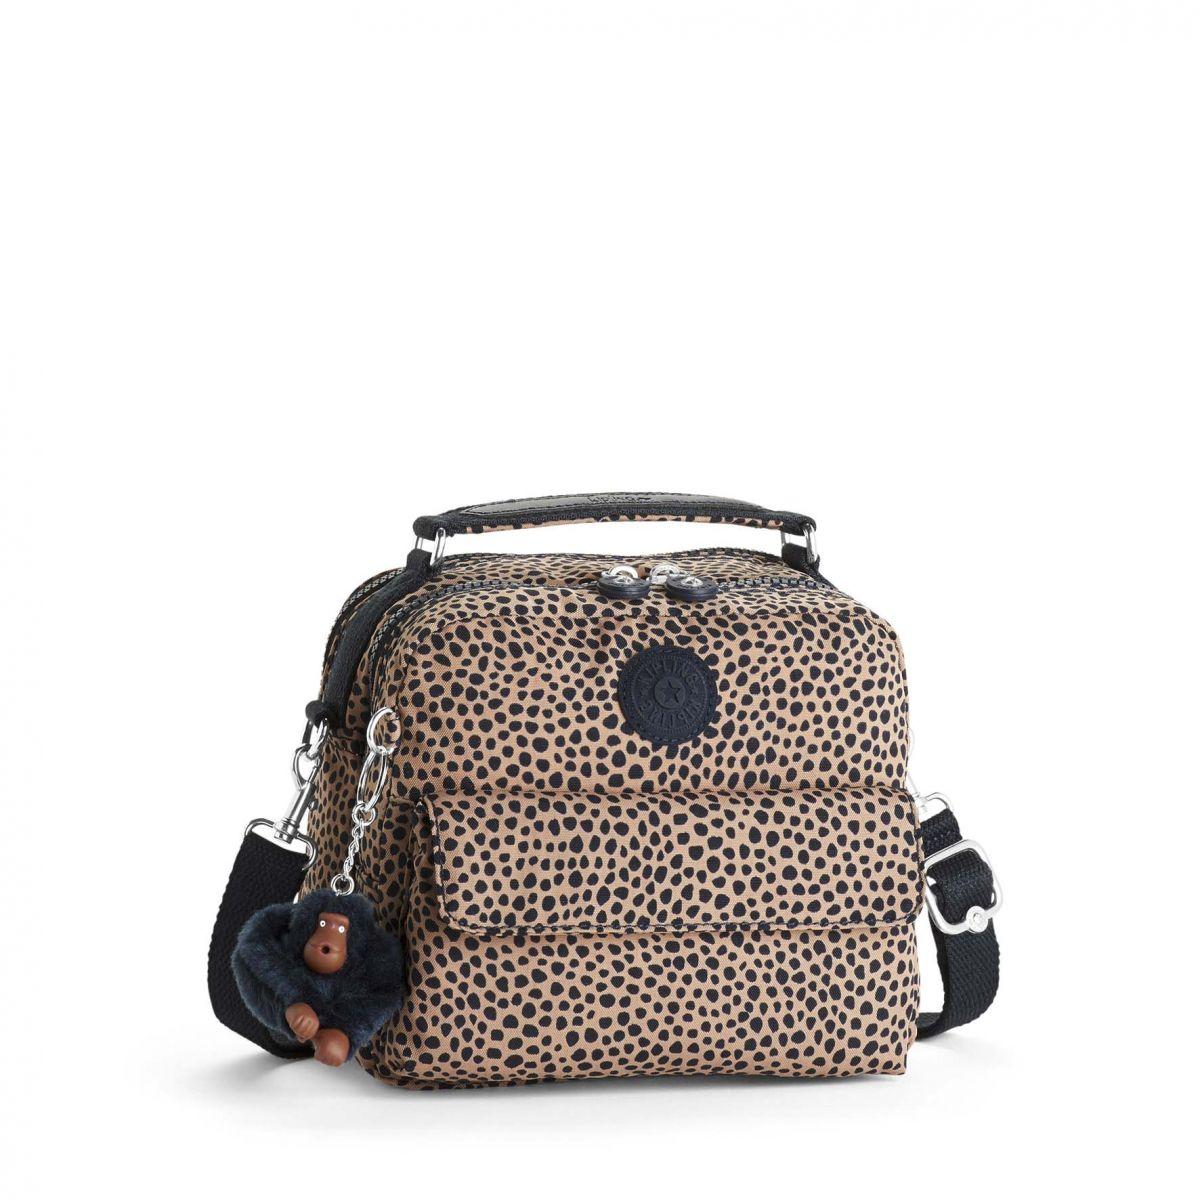 Candy Handbag Convertible To